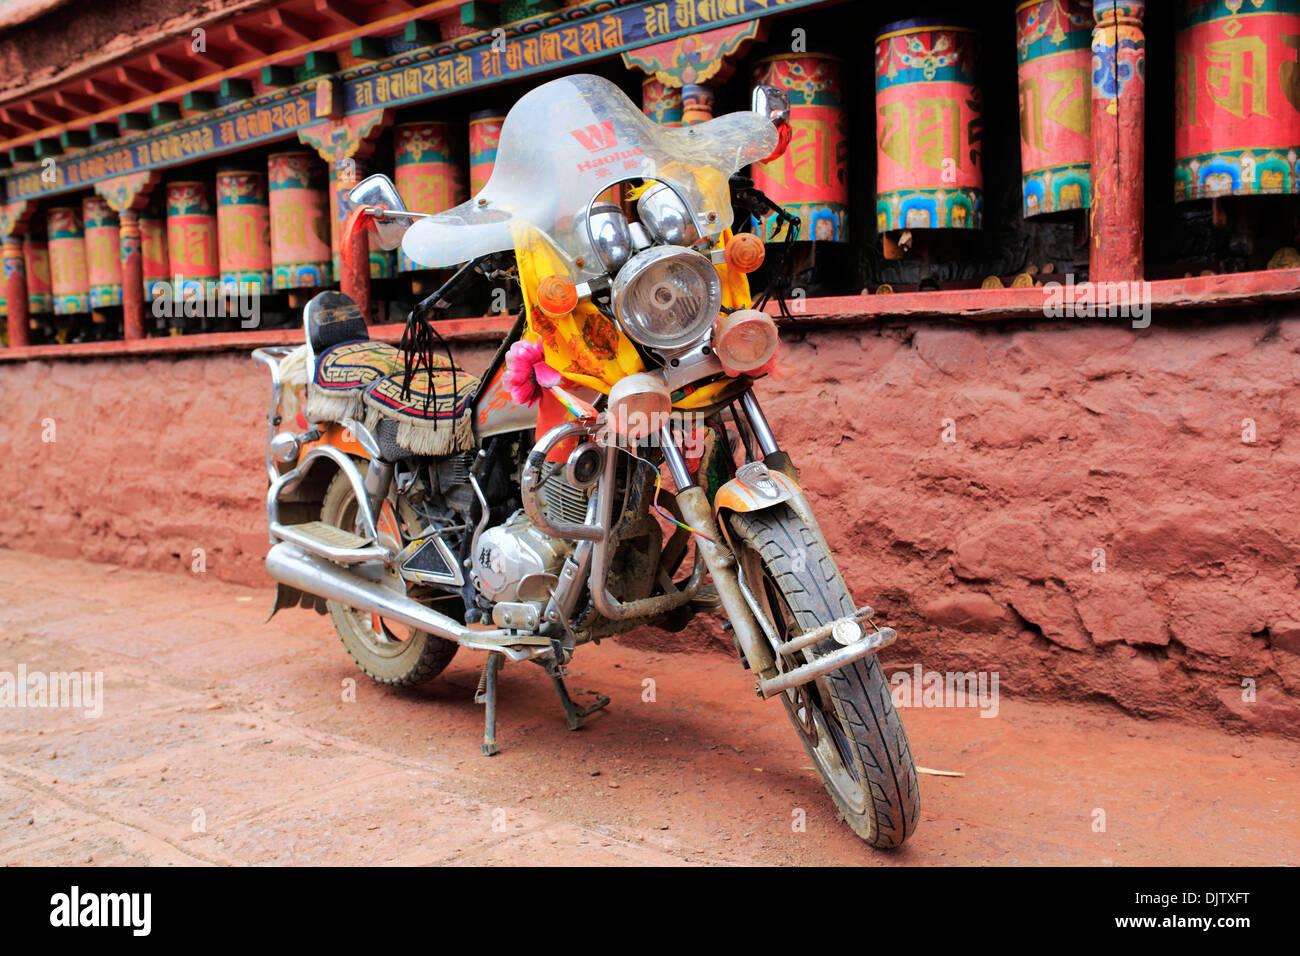 Motorbike and Prayer wheels, Sakya Monastery, Shigatse Prefecture, Tibet, China - Stock Image